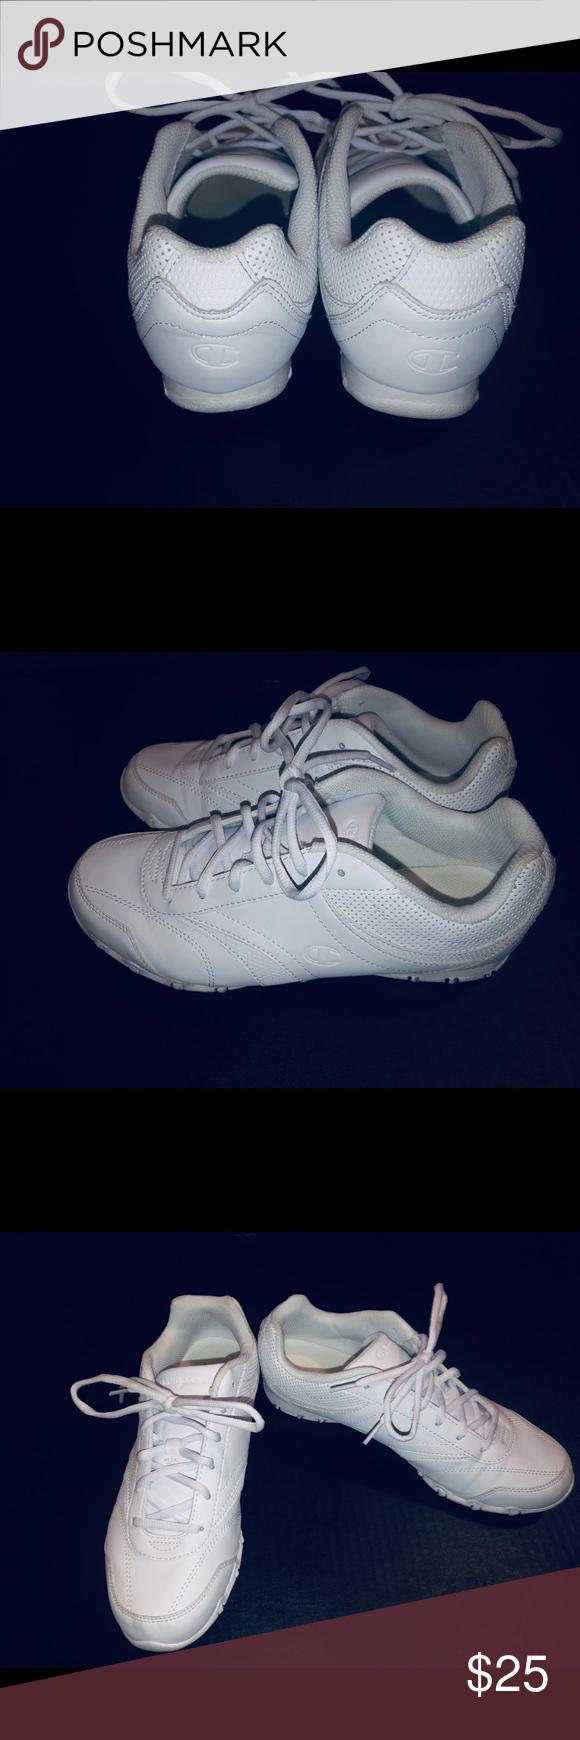 Champion brand Cheer shoes | Cheer